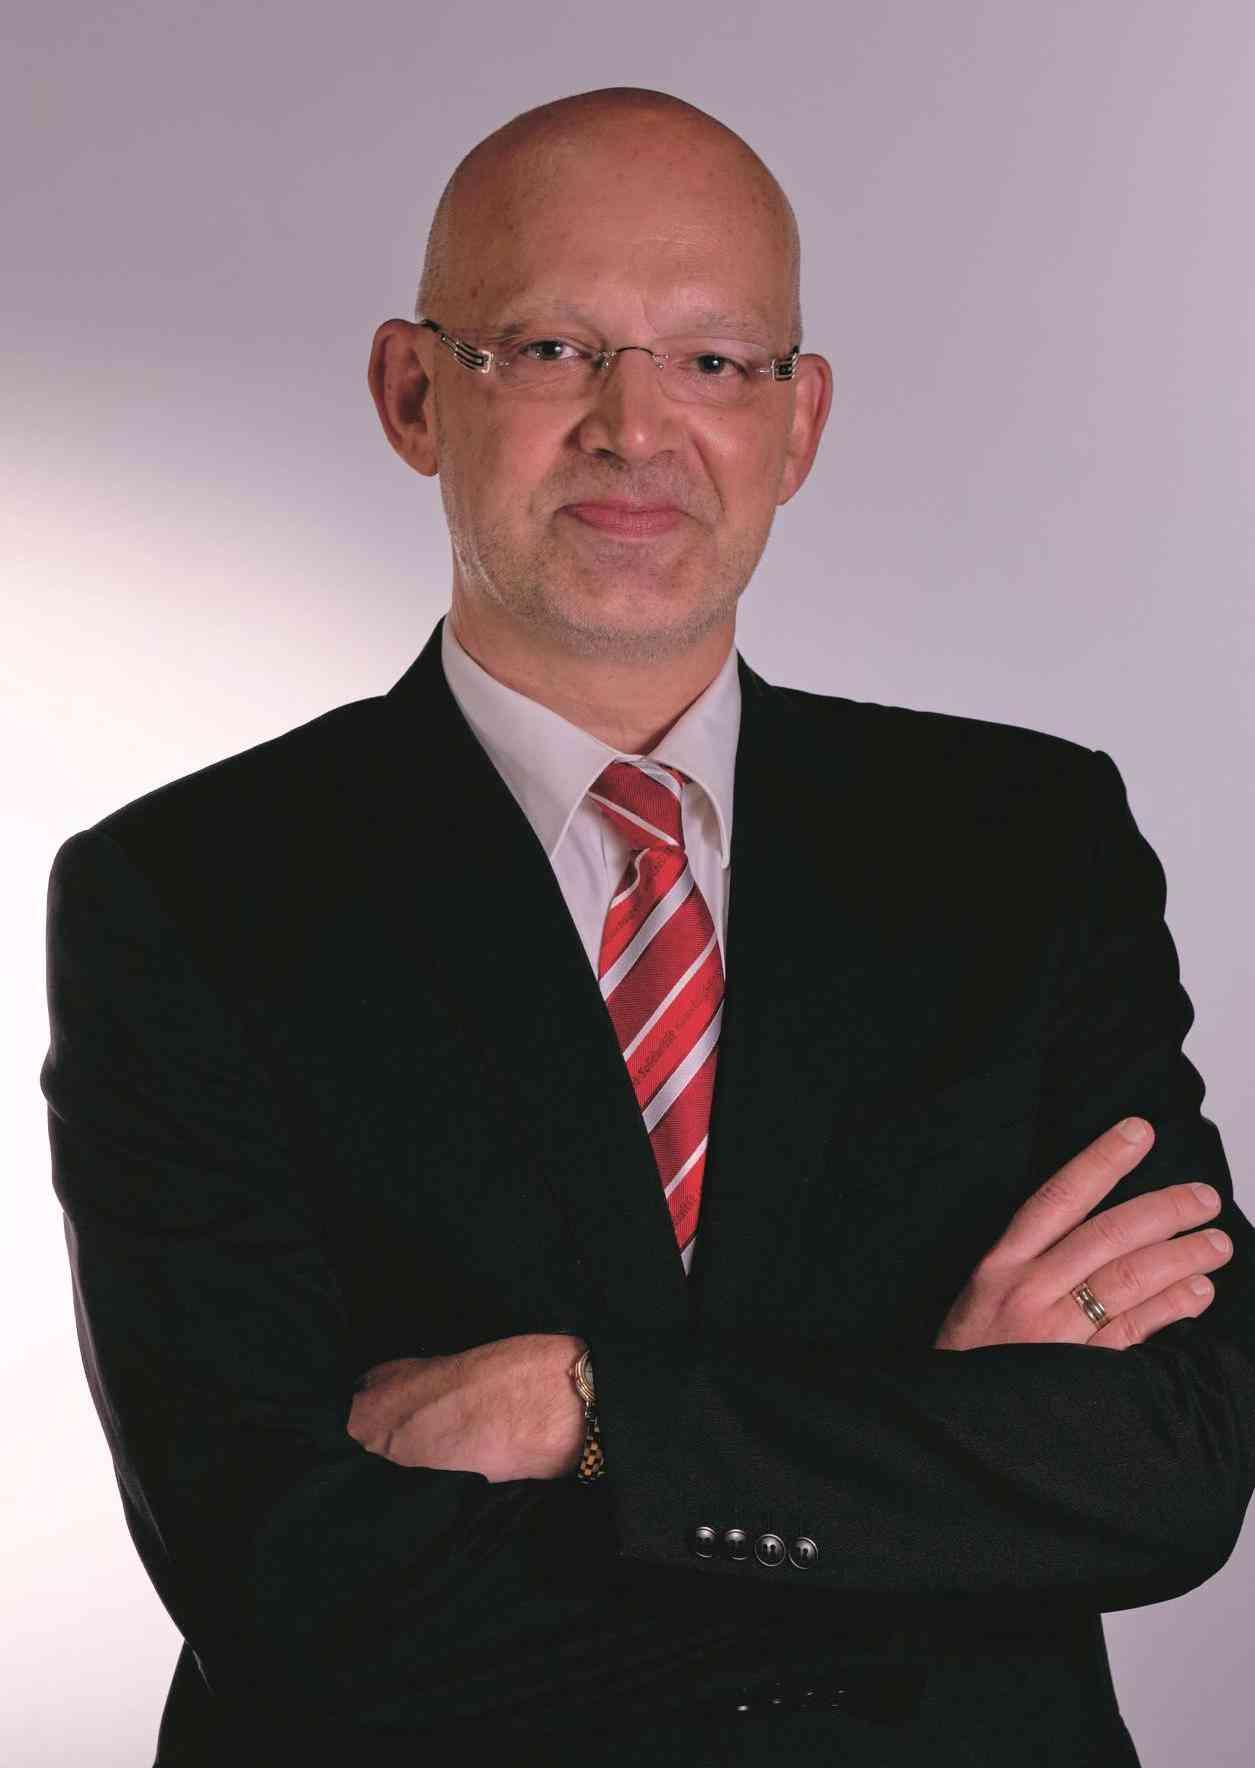 Stefan Schmeing